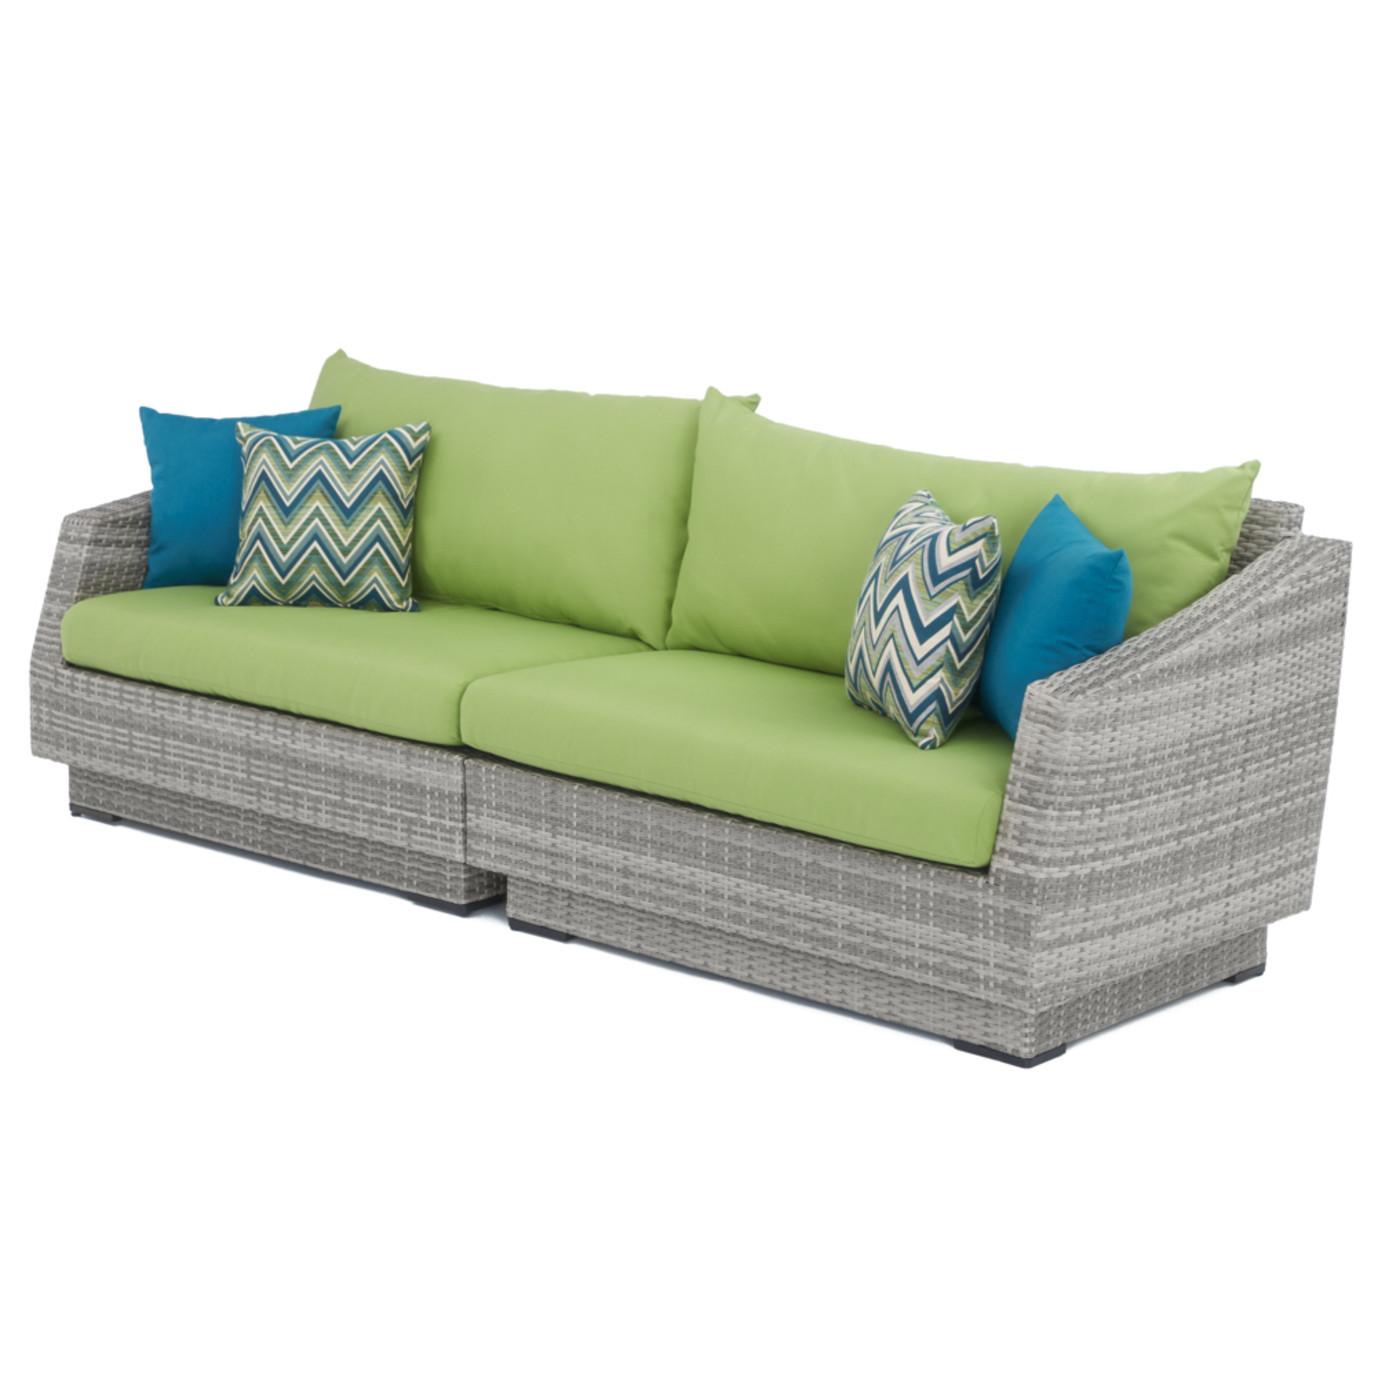 Cannes™ Sofa - Ginkgo Green